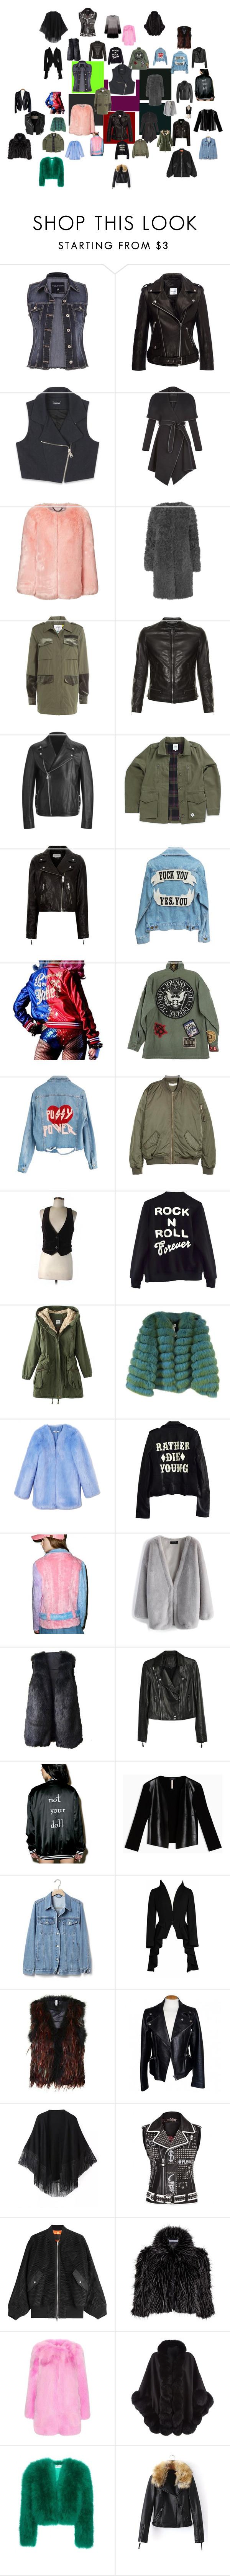 """Isabella's favourite outerwear"" by effyswanhaze on Polyvore featuring moda, maurices, Anine Bing, Bebe, BCBGeneration, L.K.Bennett, SJYP, Dolce&Gabbana, Versus e Vans"